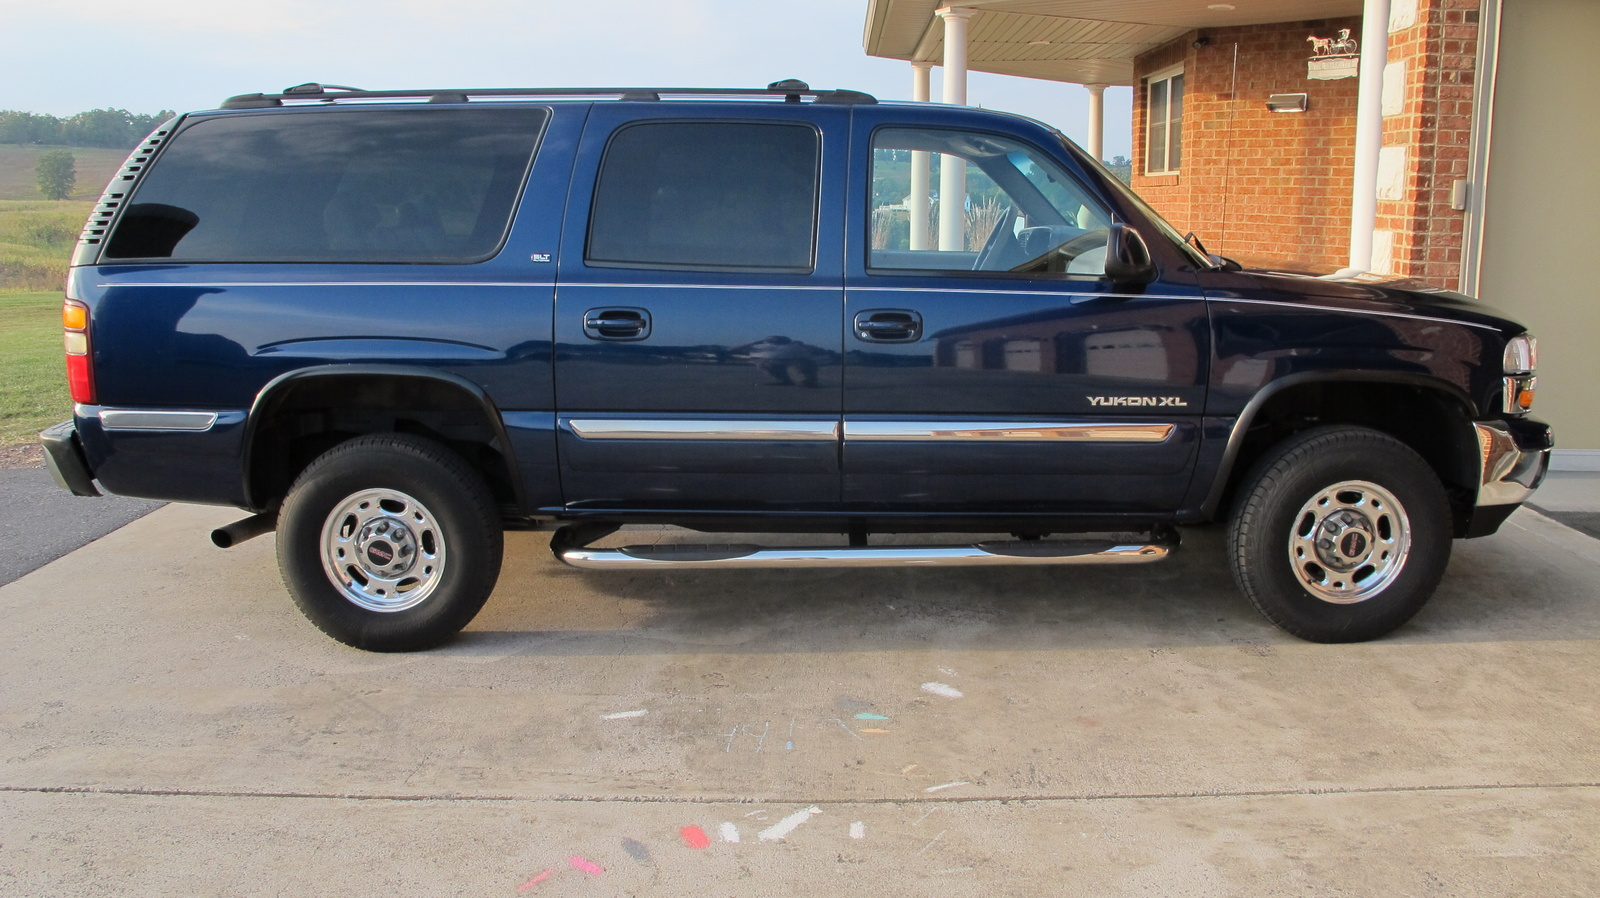 Line Art Xl 2002 : Chevrolet suburban  indigo blue metallic